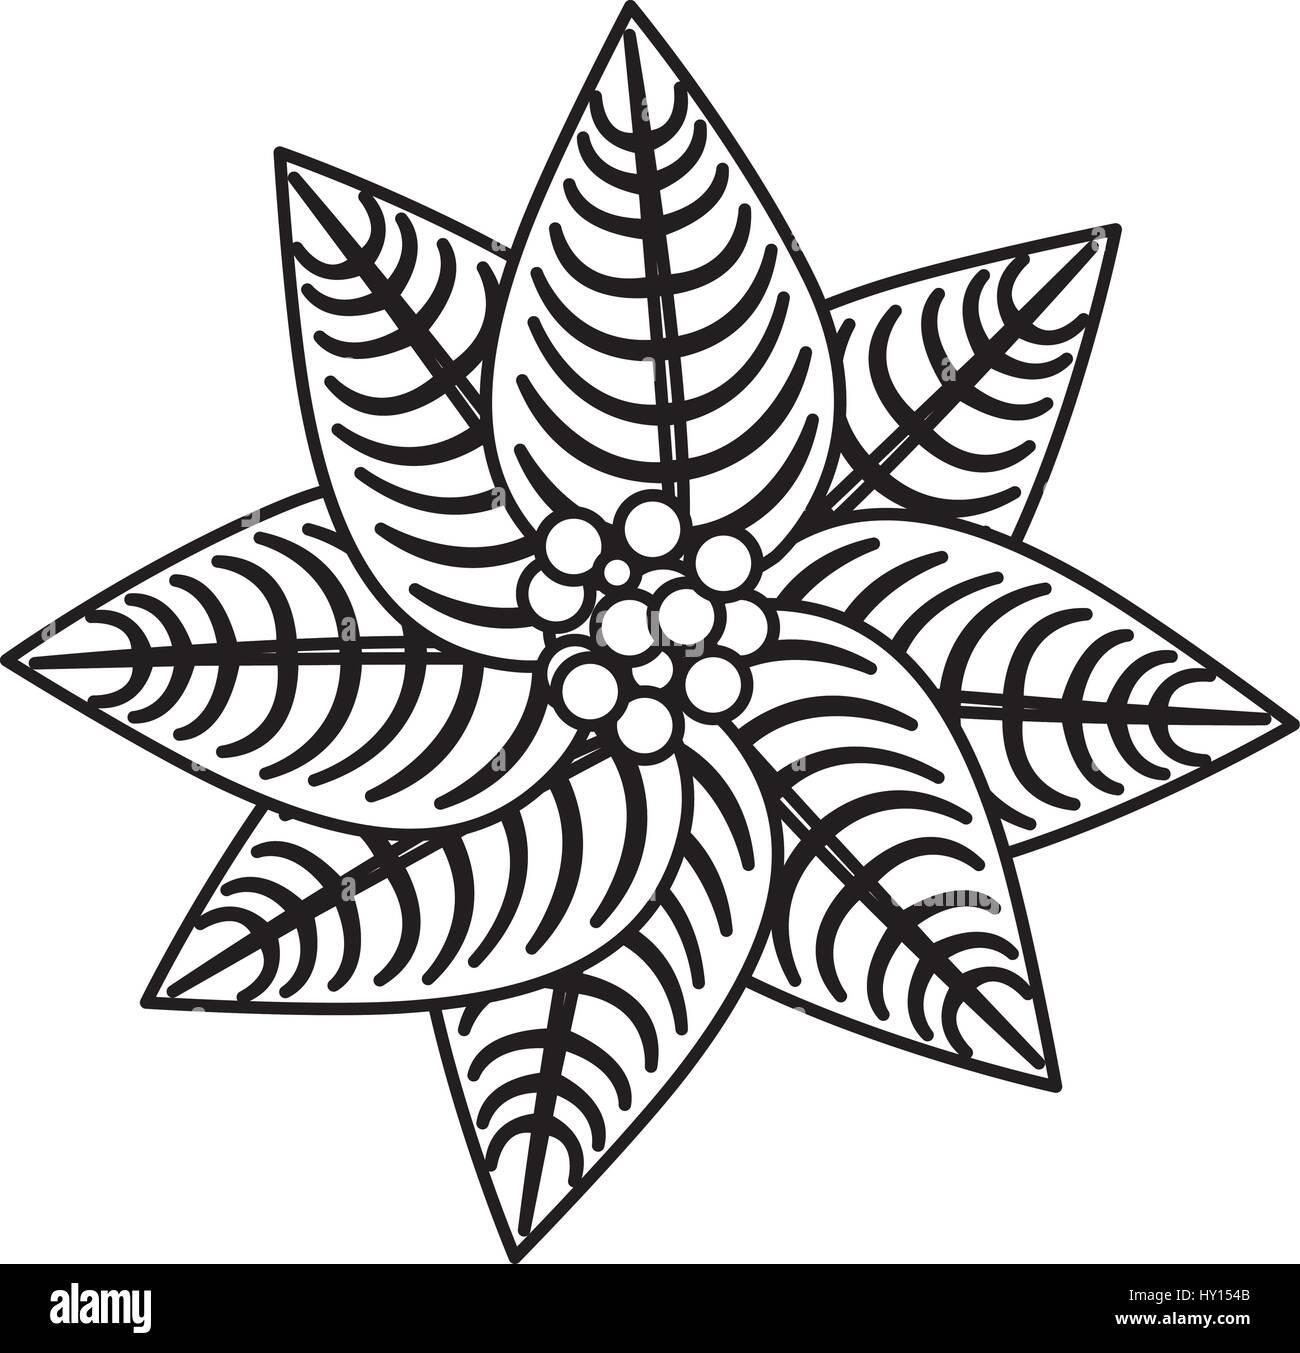 Silhouette Poinsettia Christmas Flowers Icon Design Stock Vector Image Art Alamy